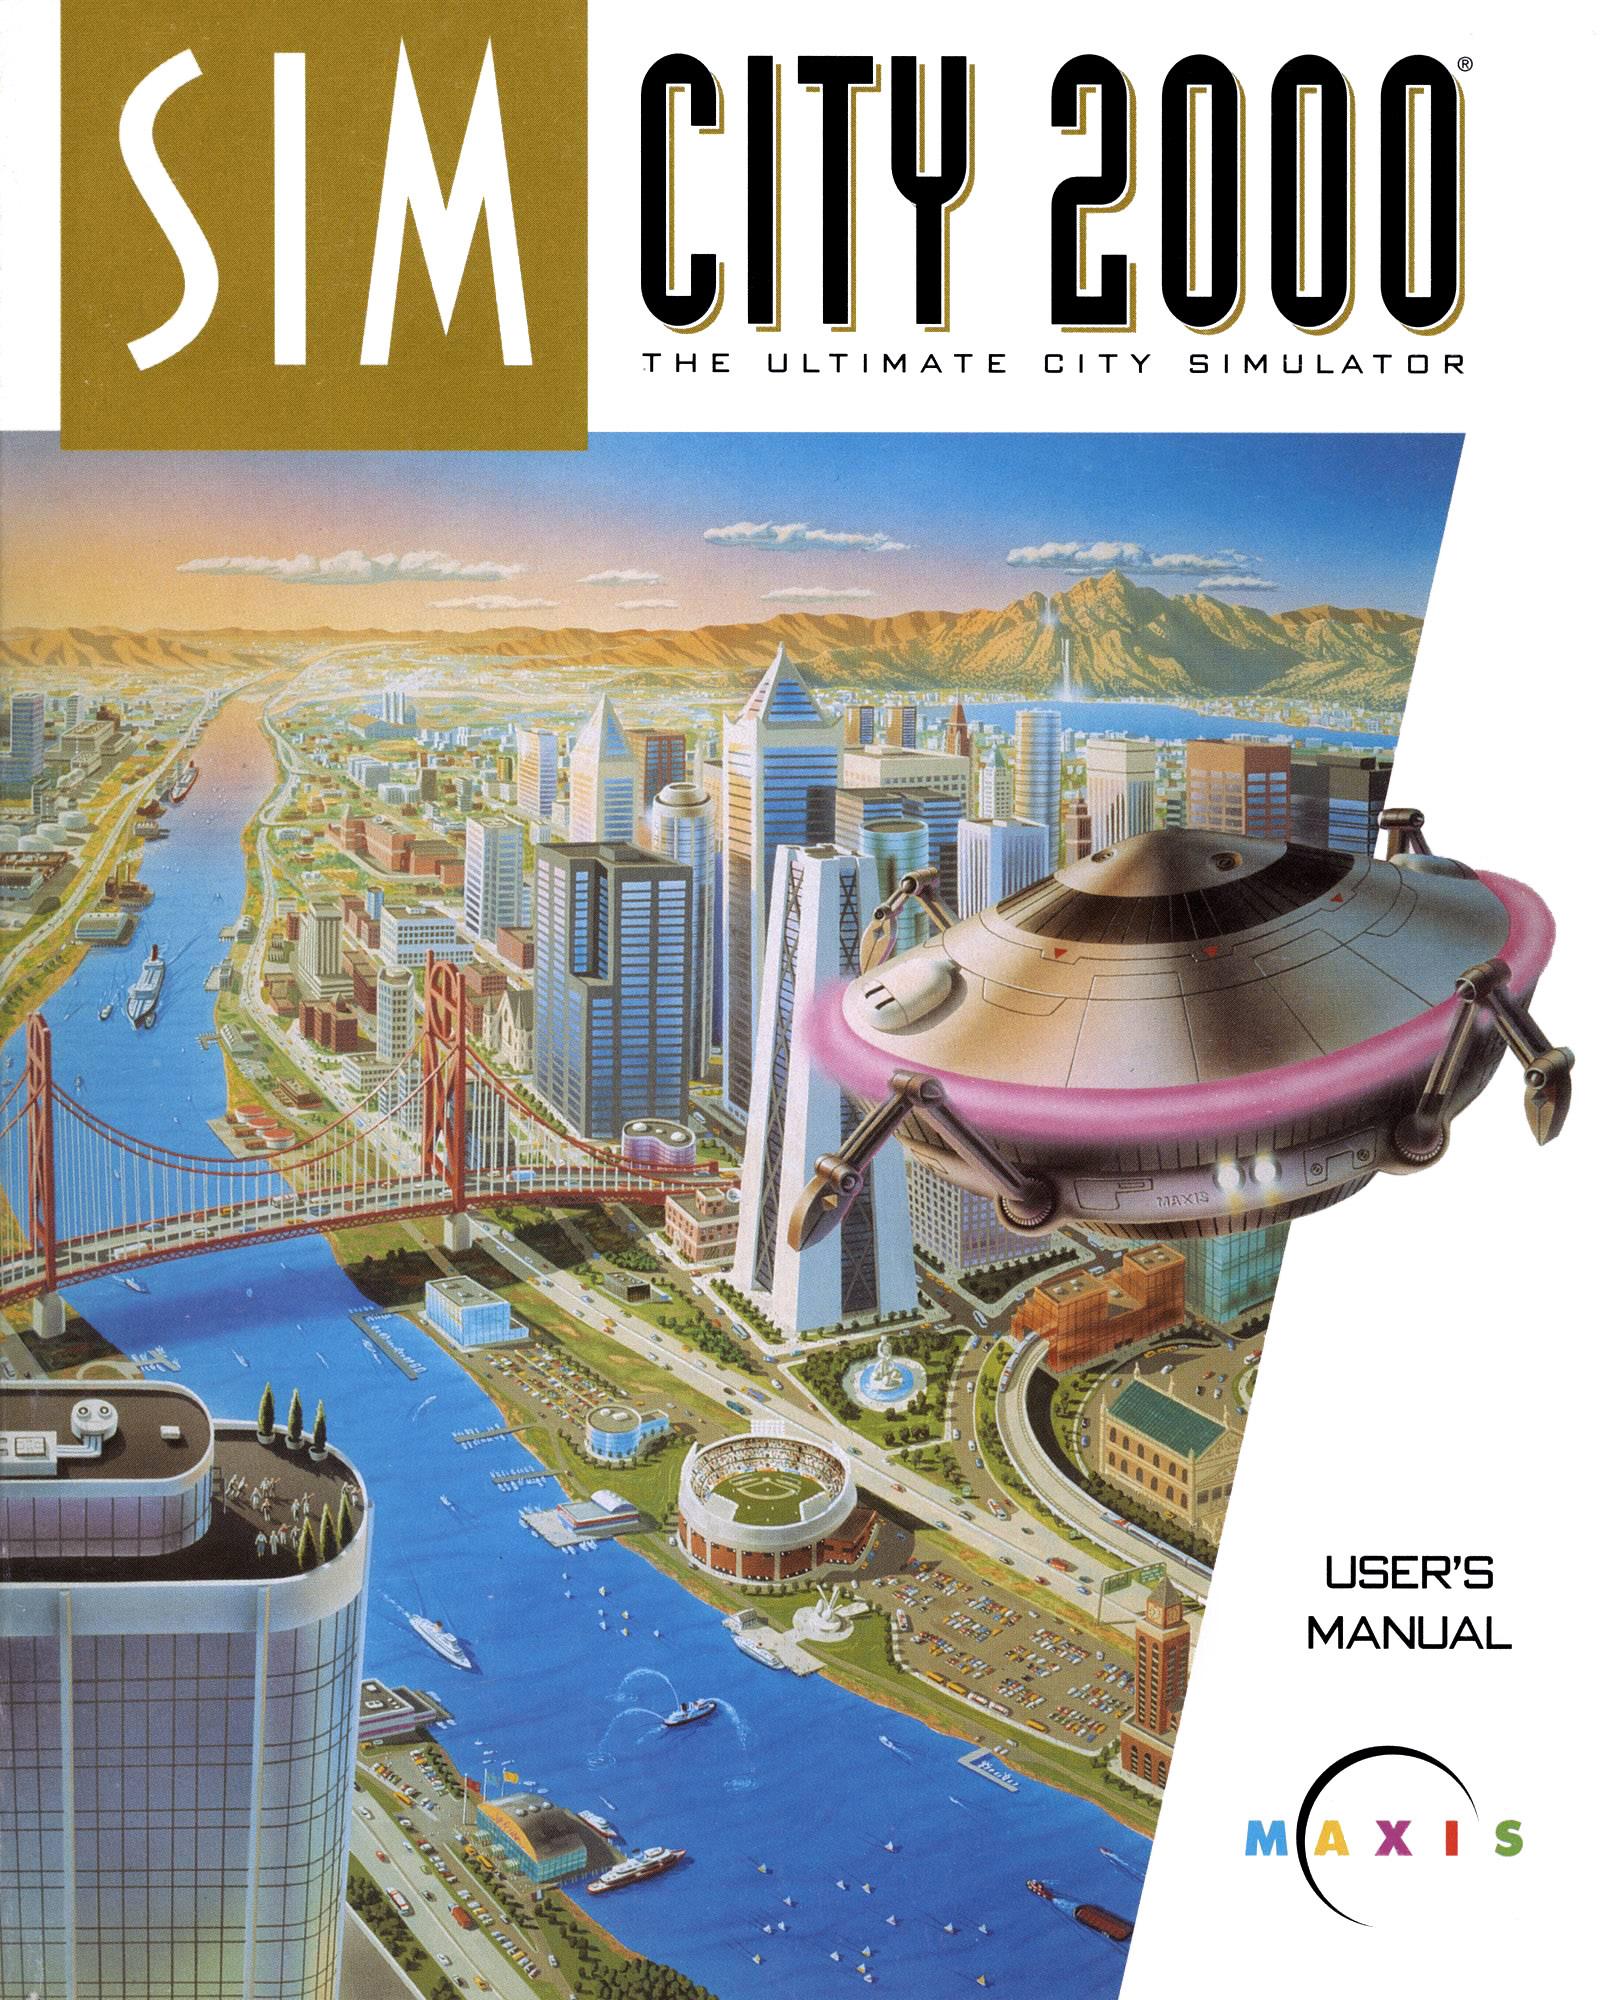 File:SimCity2000Box.jpg